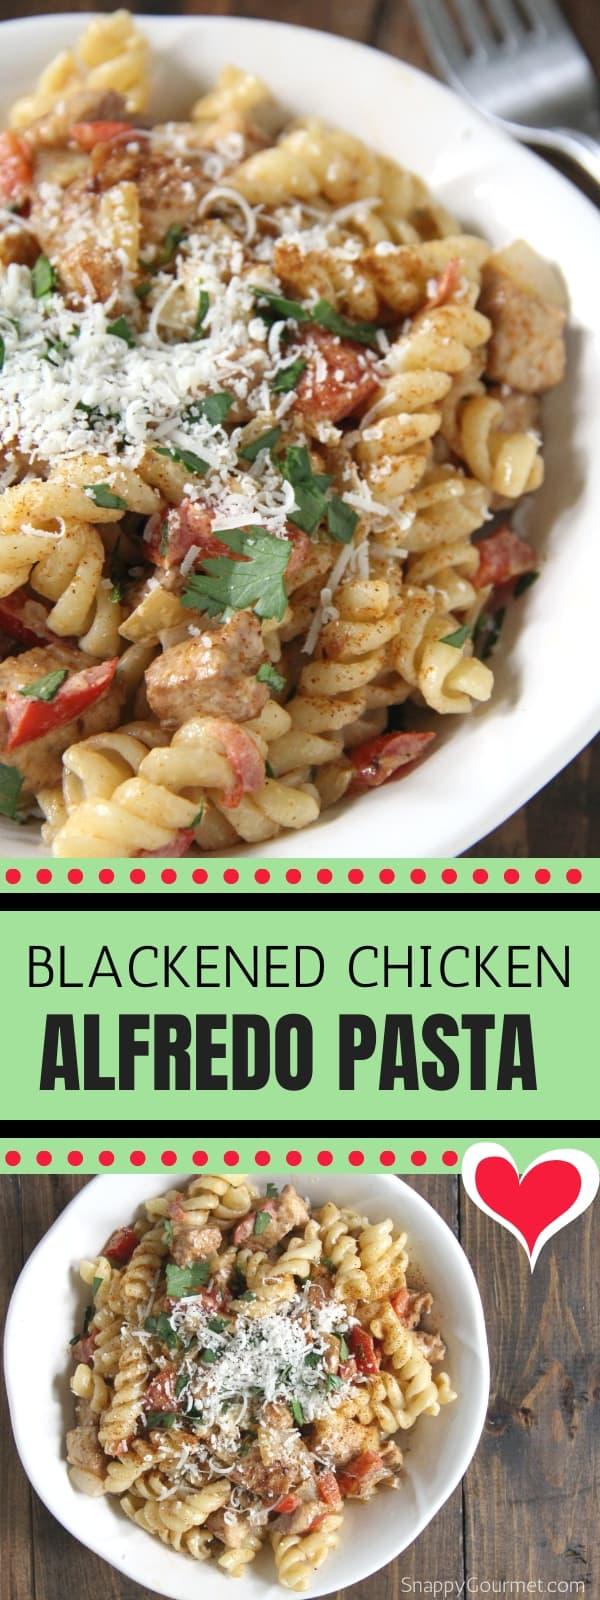 Blackened Chicken Alfredo Pasta photo collage